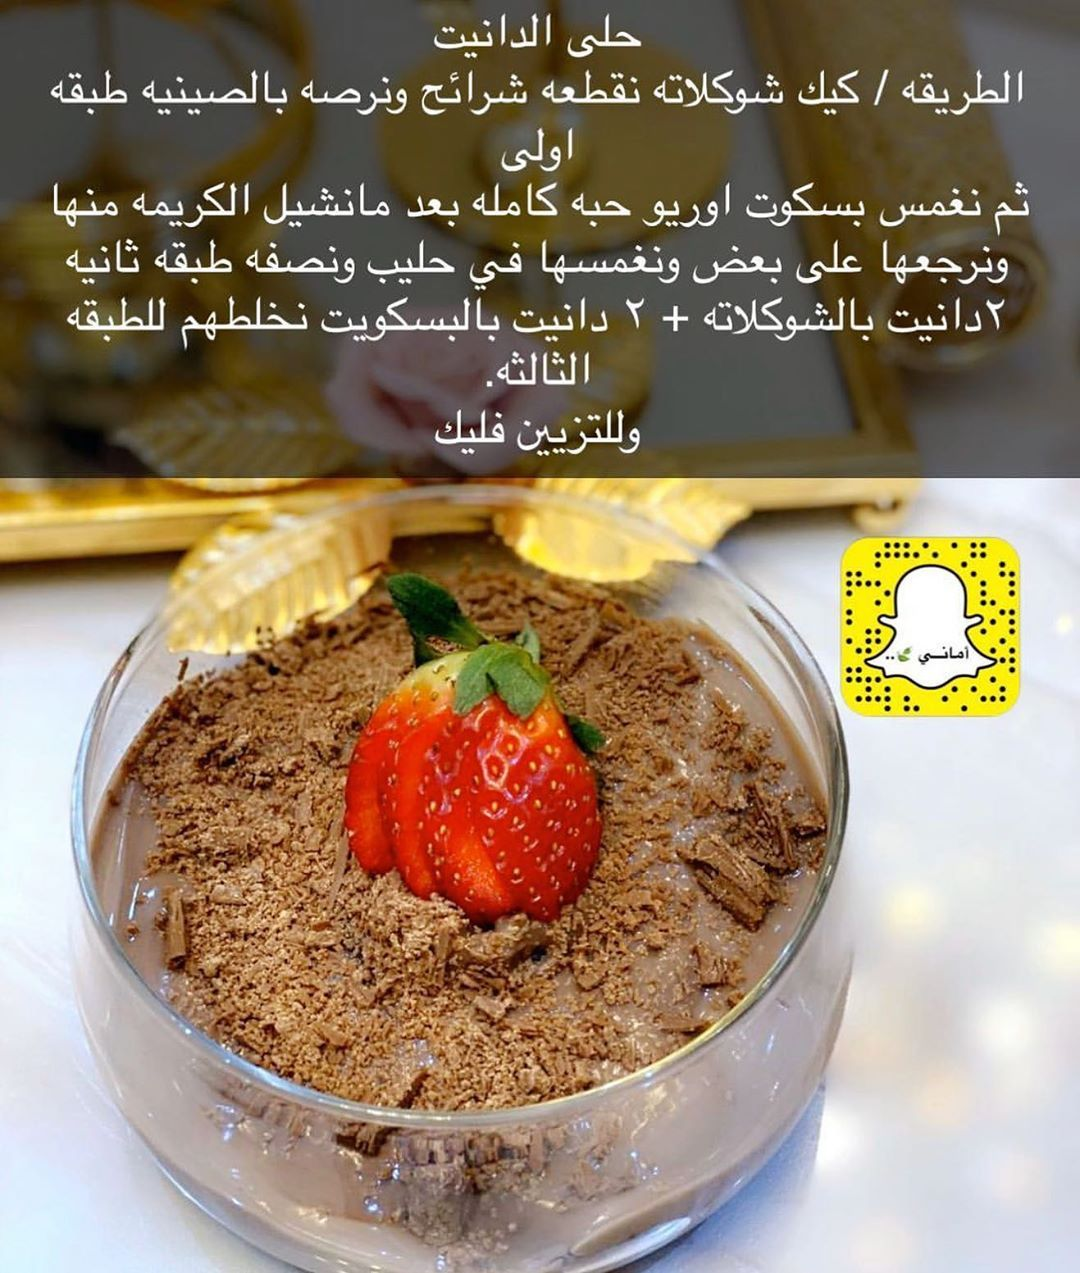 334 Likes 0 Comments الح مد لله فوق ك ل ش عور Aklat25 On Instagram وصفات من Amani Almadinah In 2021 Food Receipes Recipes Food